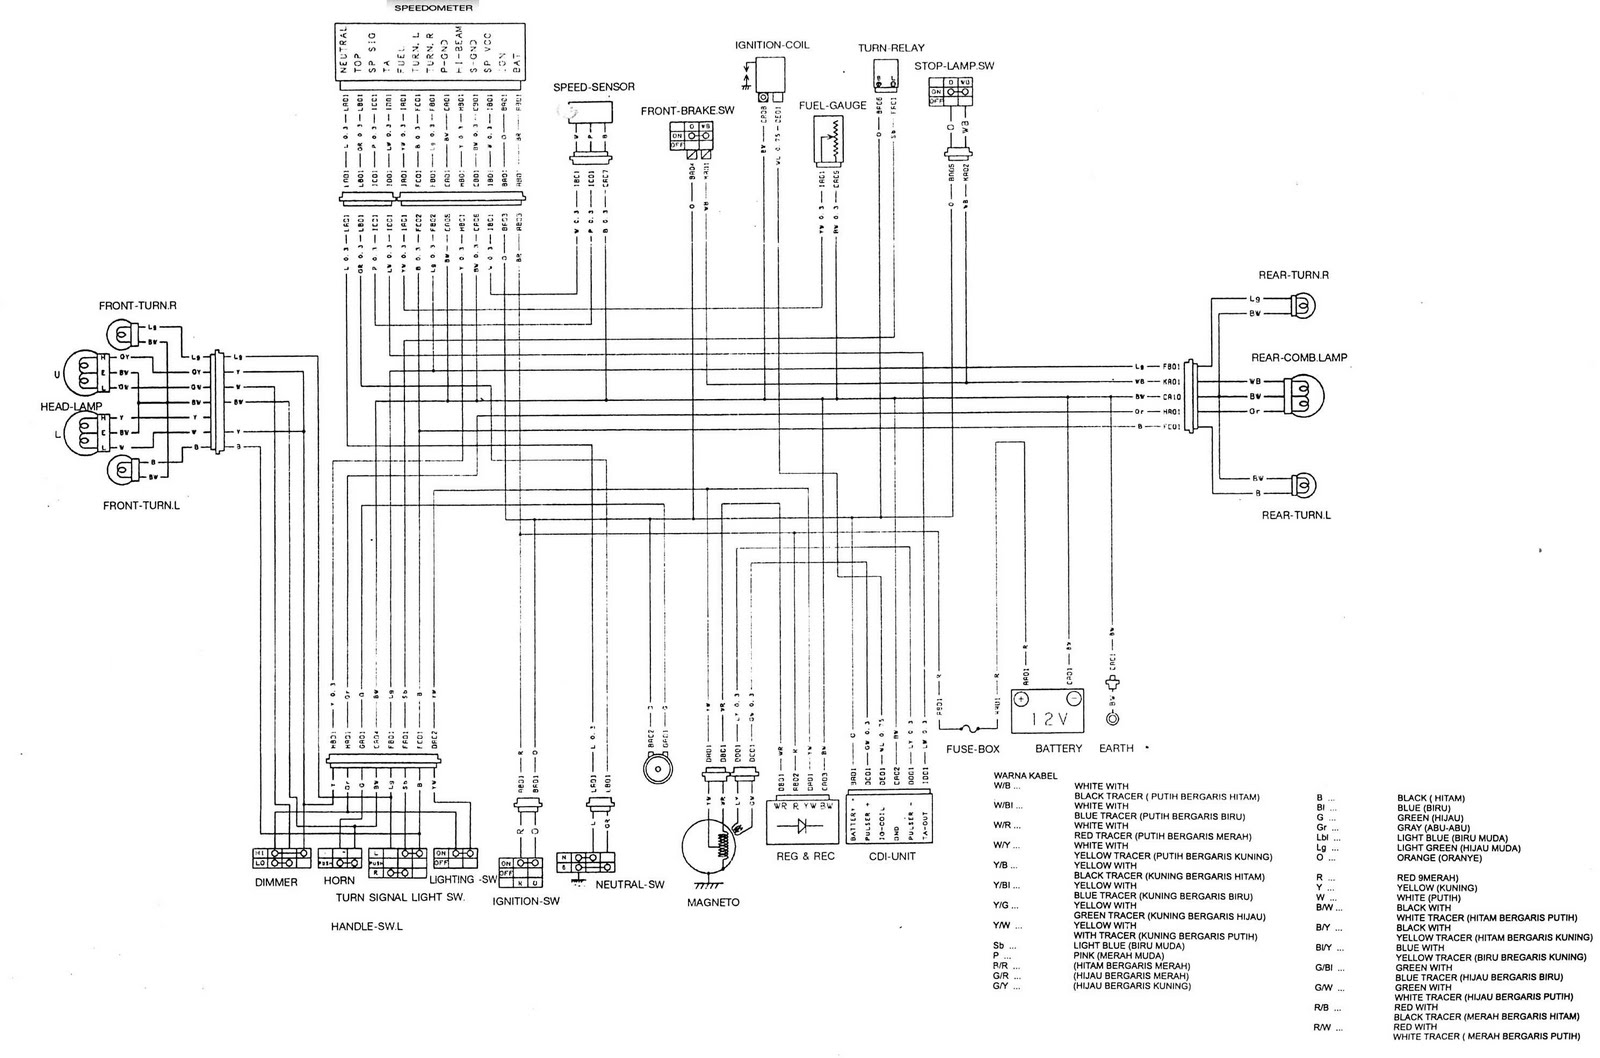 medium resolution of wrg 8908 motofino wiring diagramverucci wiring diagram verucci free engine image for verucci luggage verucci